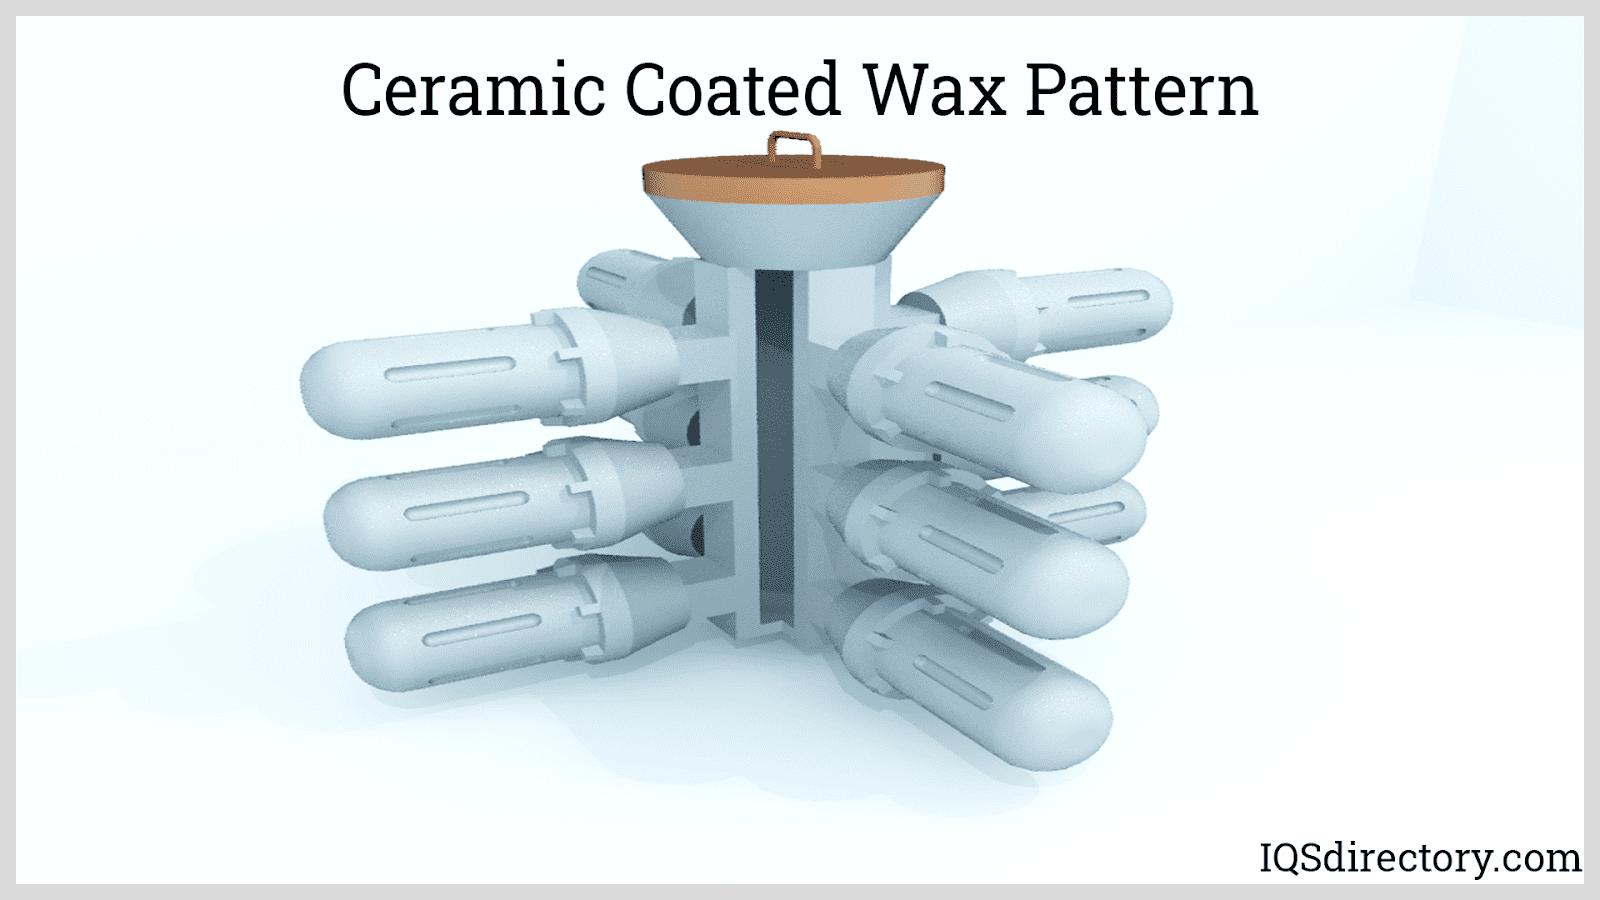 Ceramic Coated Wax Pattern